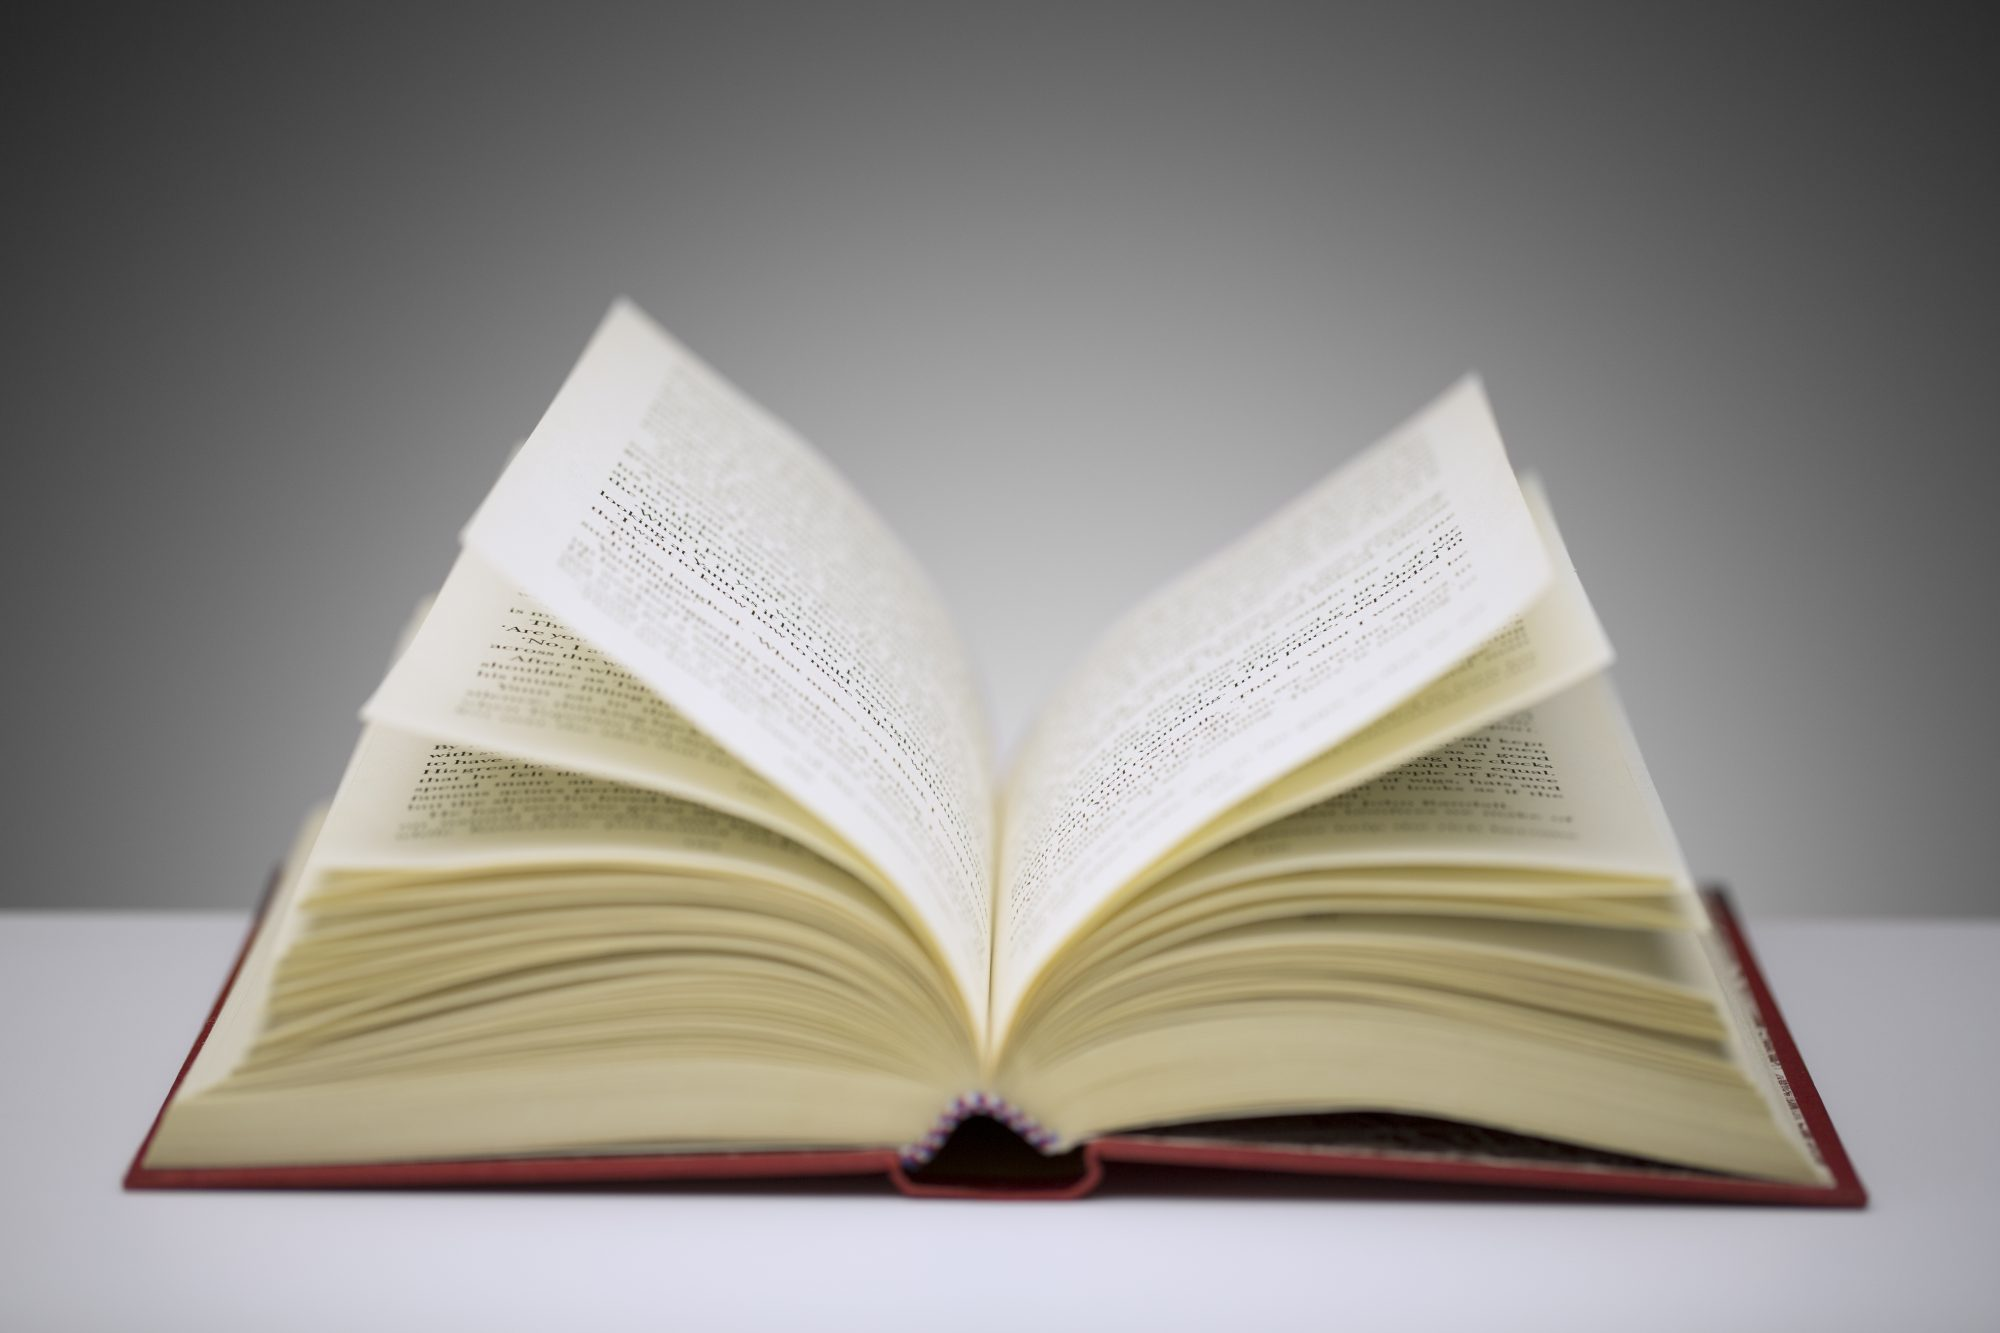 amazon-most-read-book-handmaids-tale